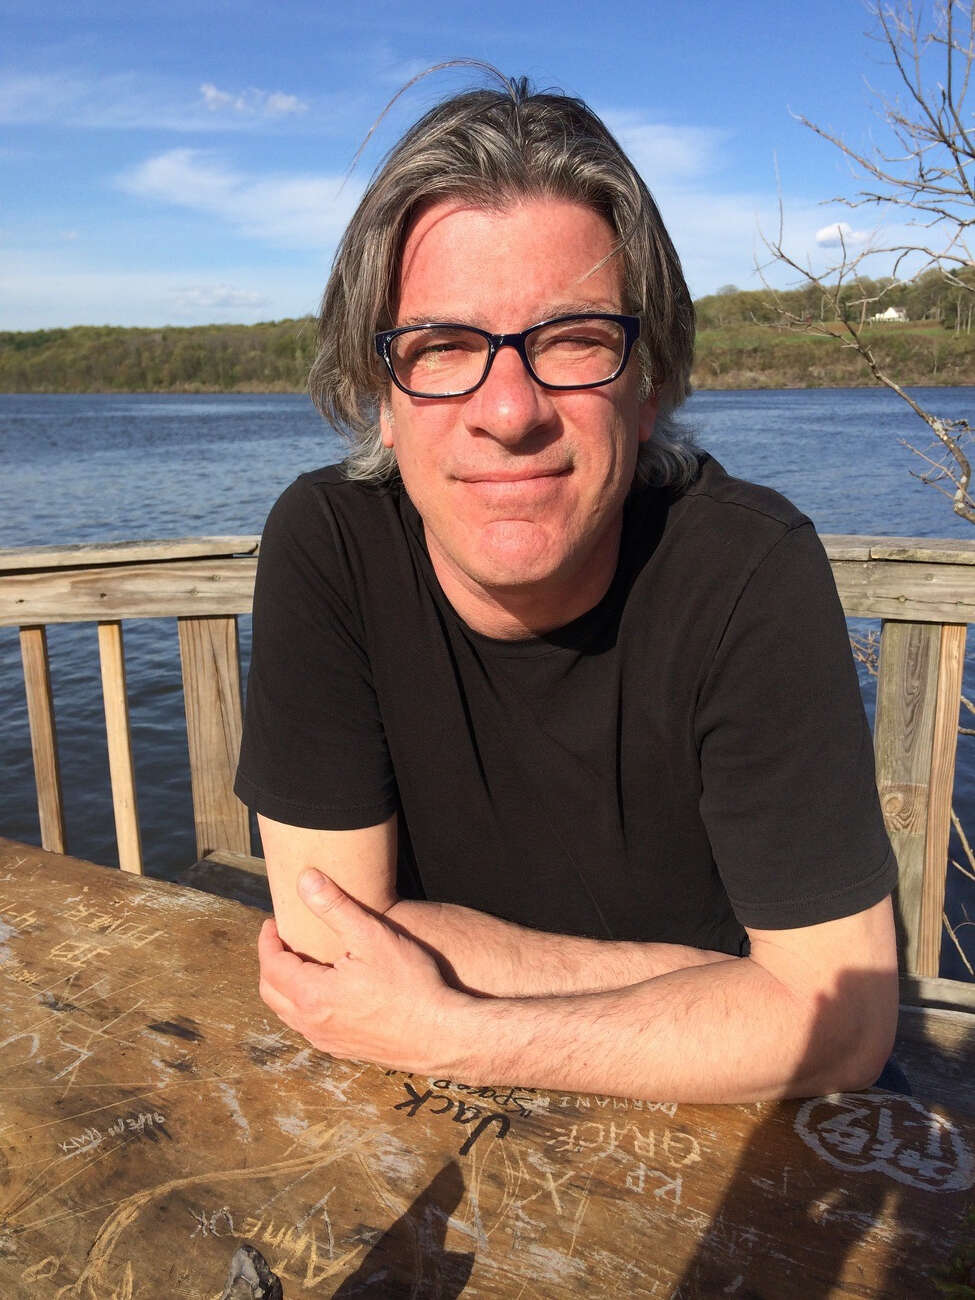 Hudson-based author David McDonald wrote